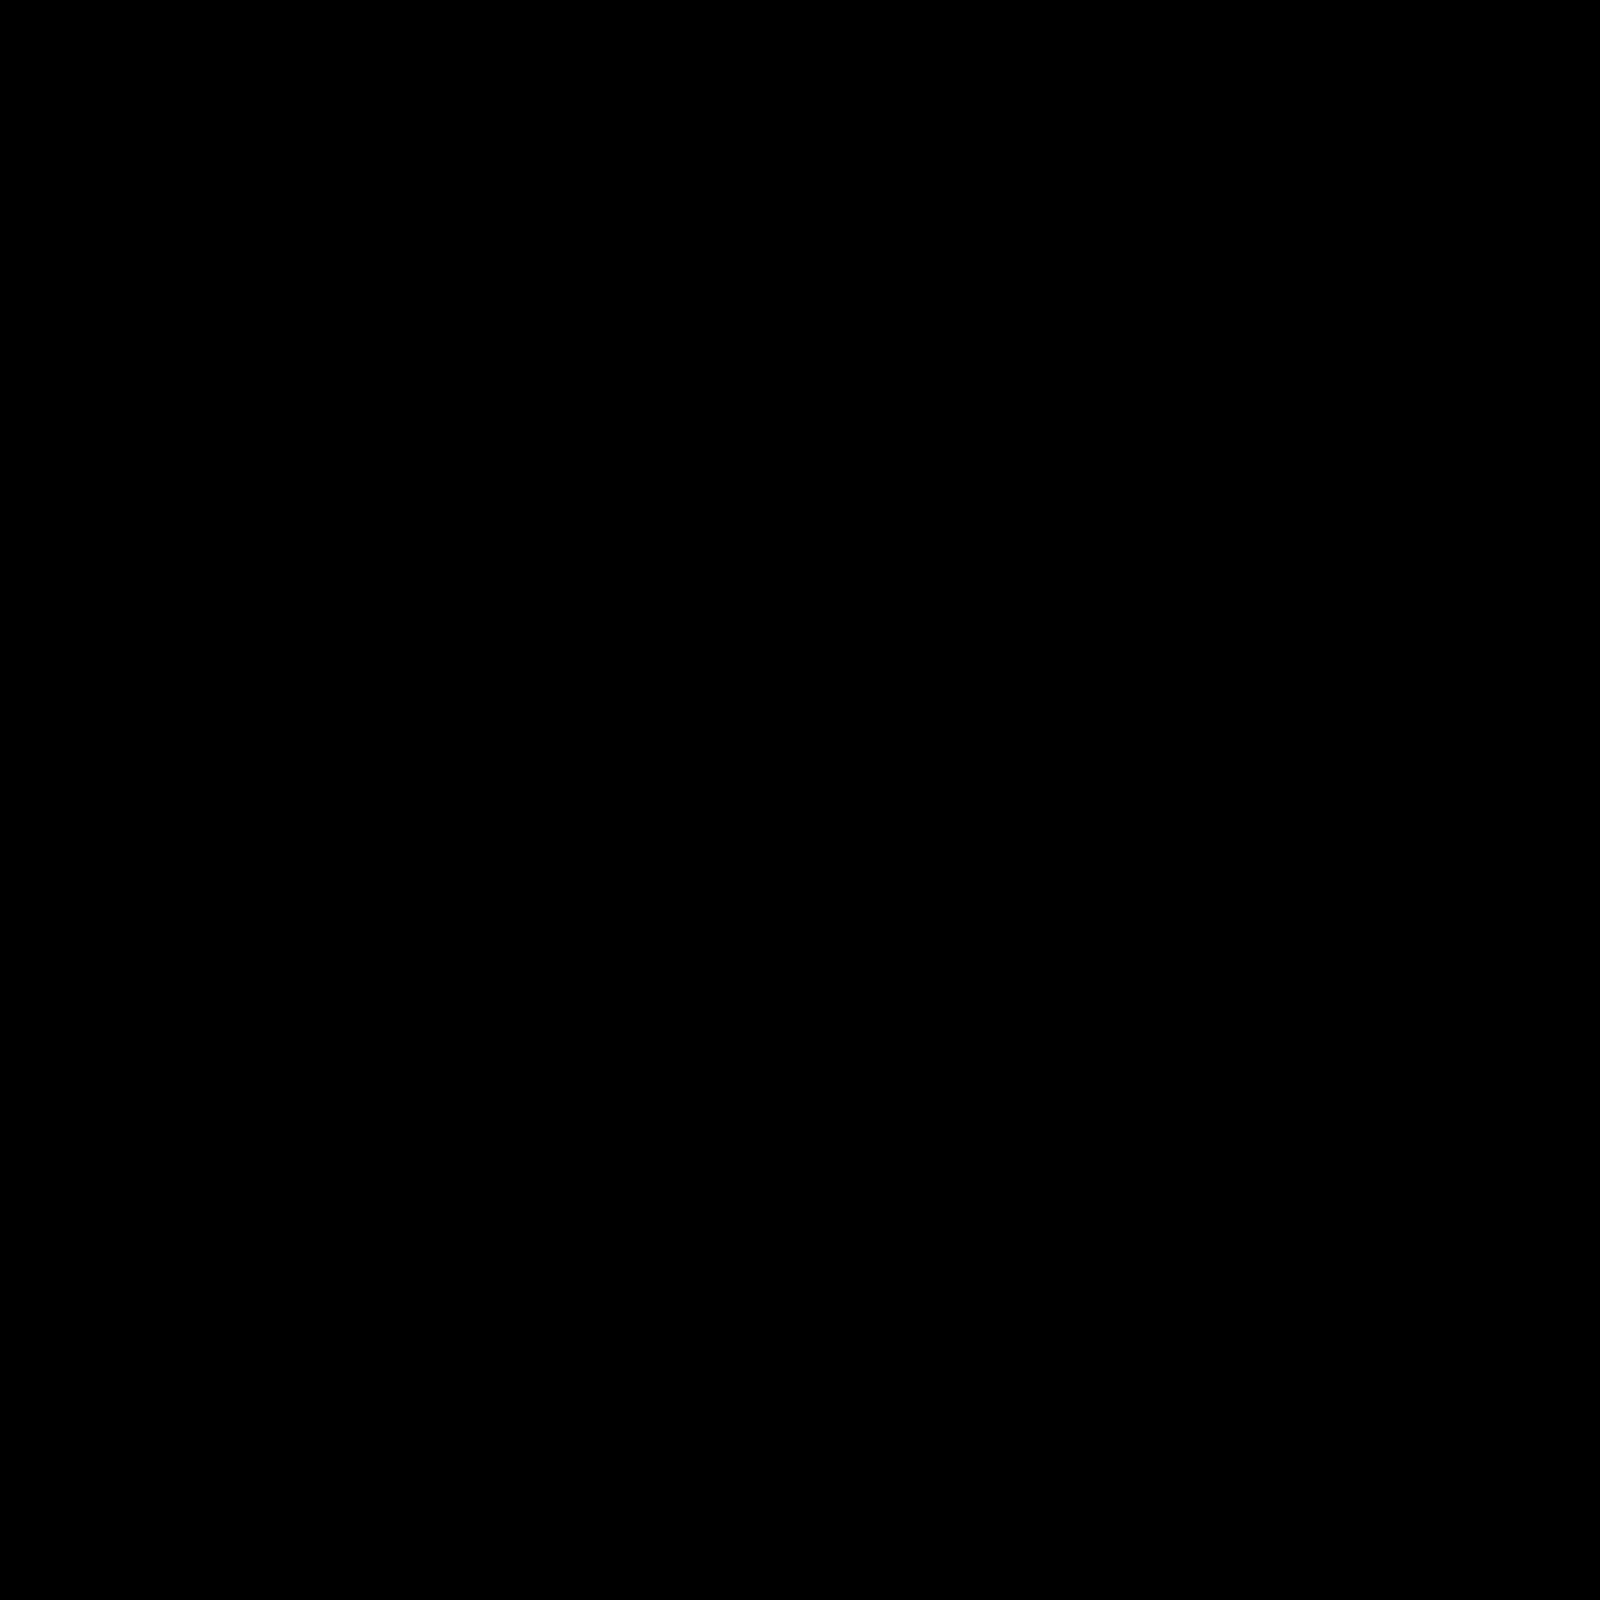 Chmura w kropki icon